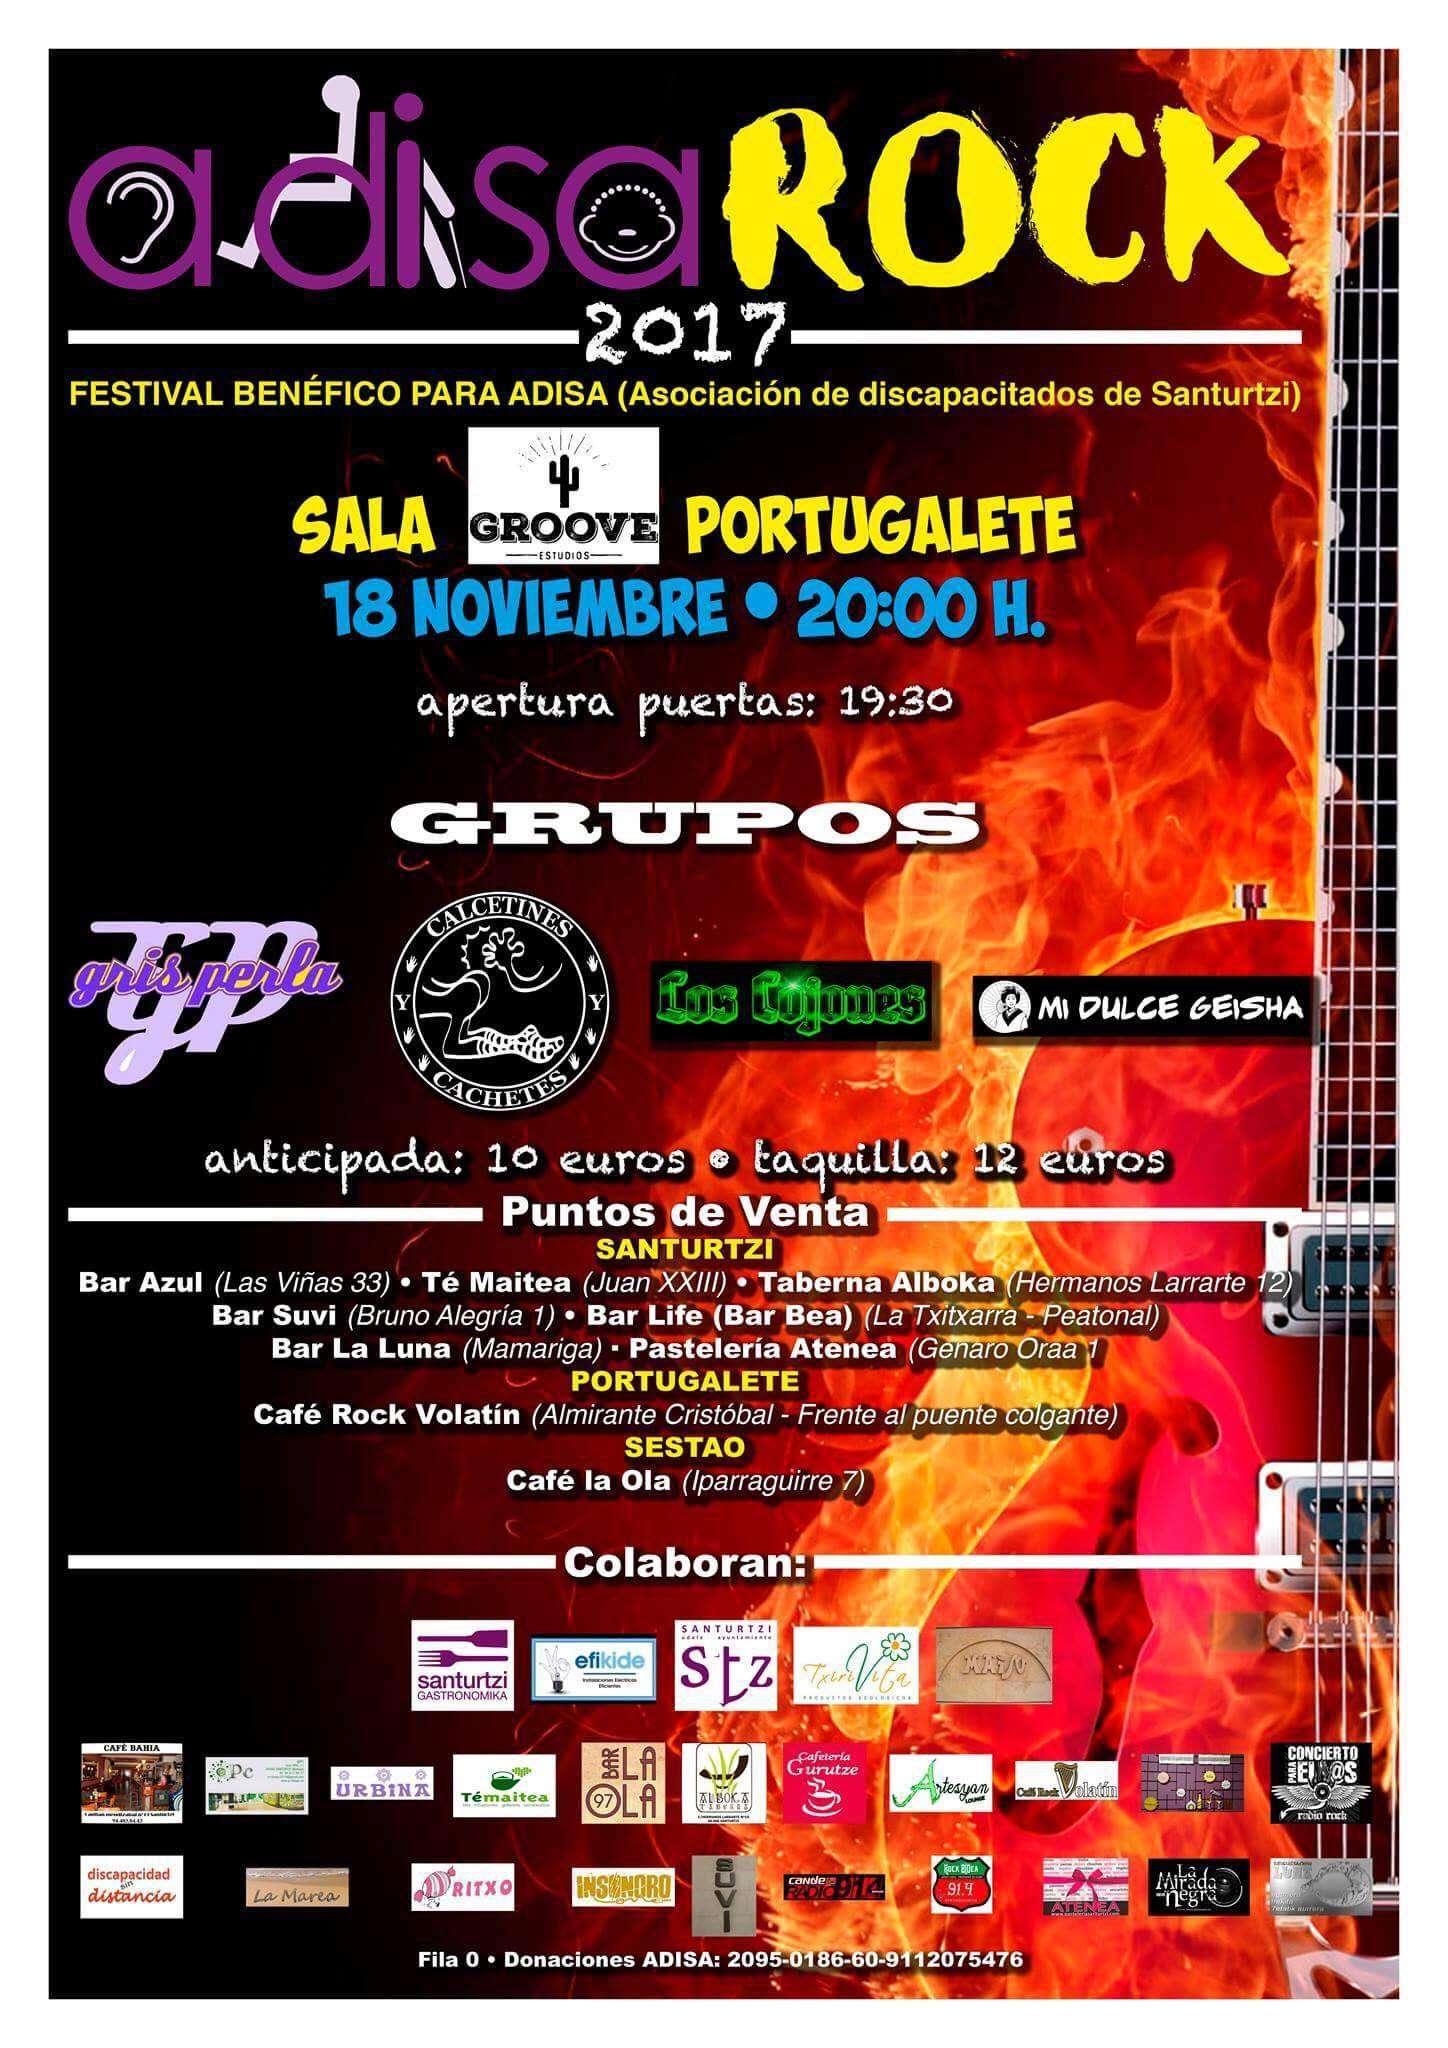 Adisarock 2017 - Sala Groove